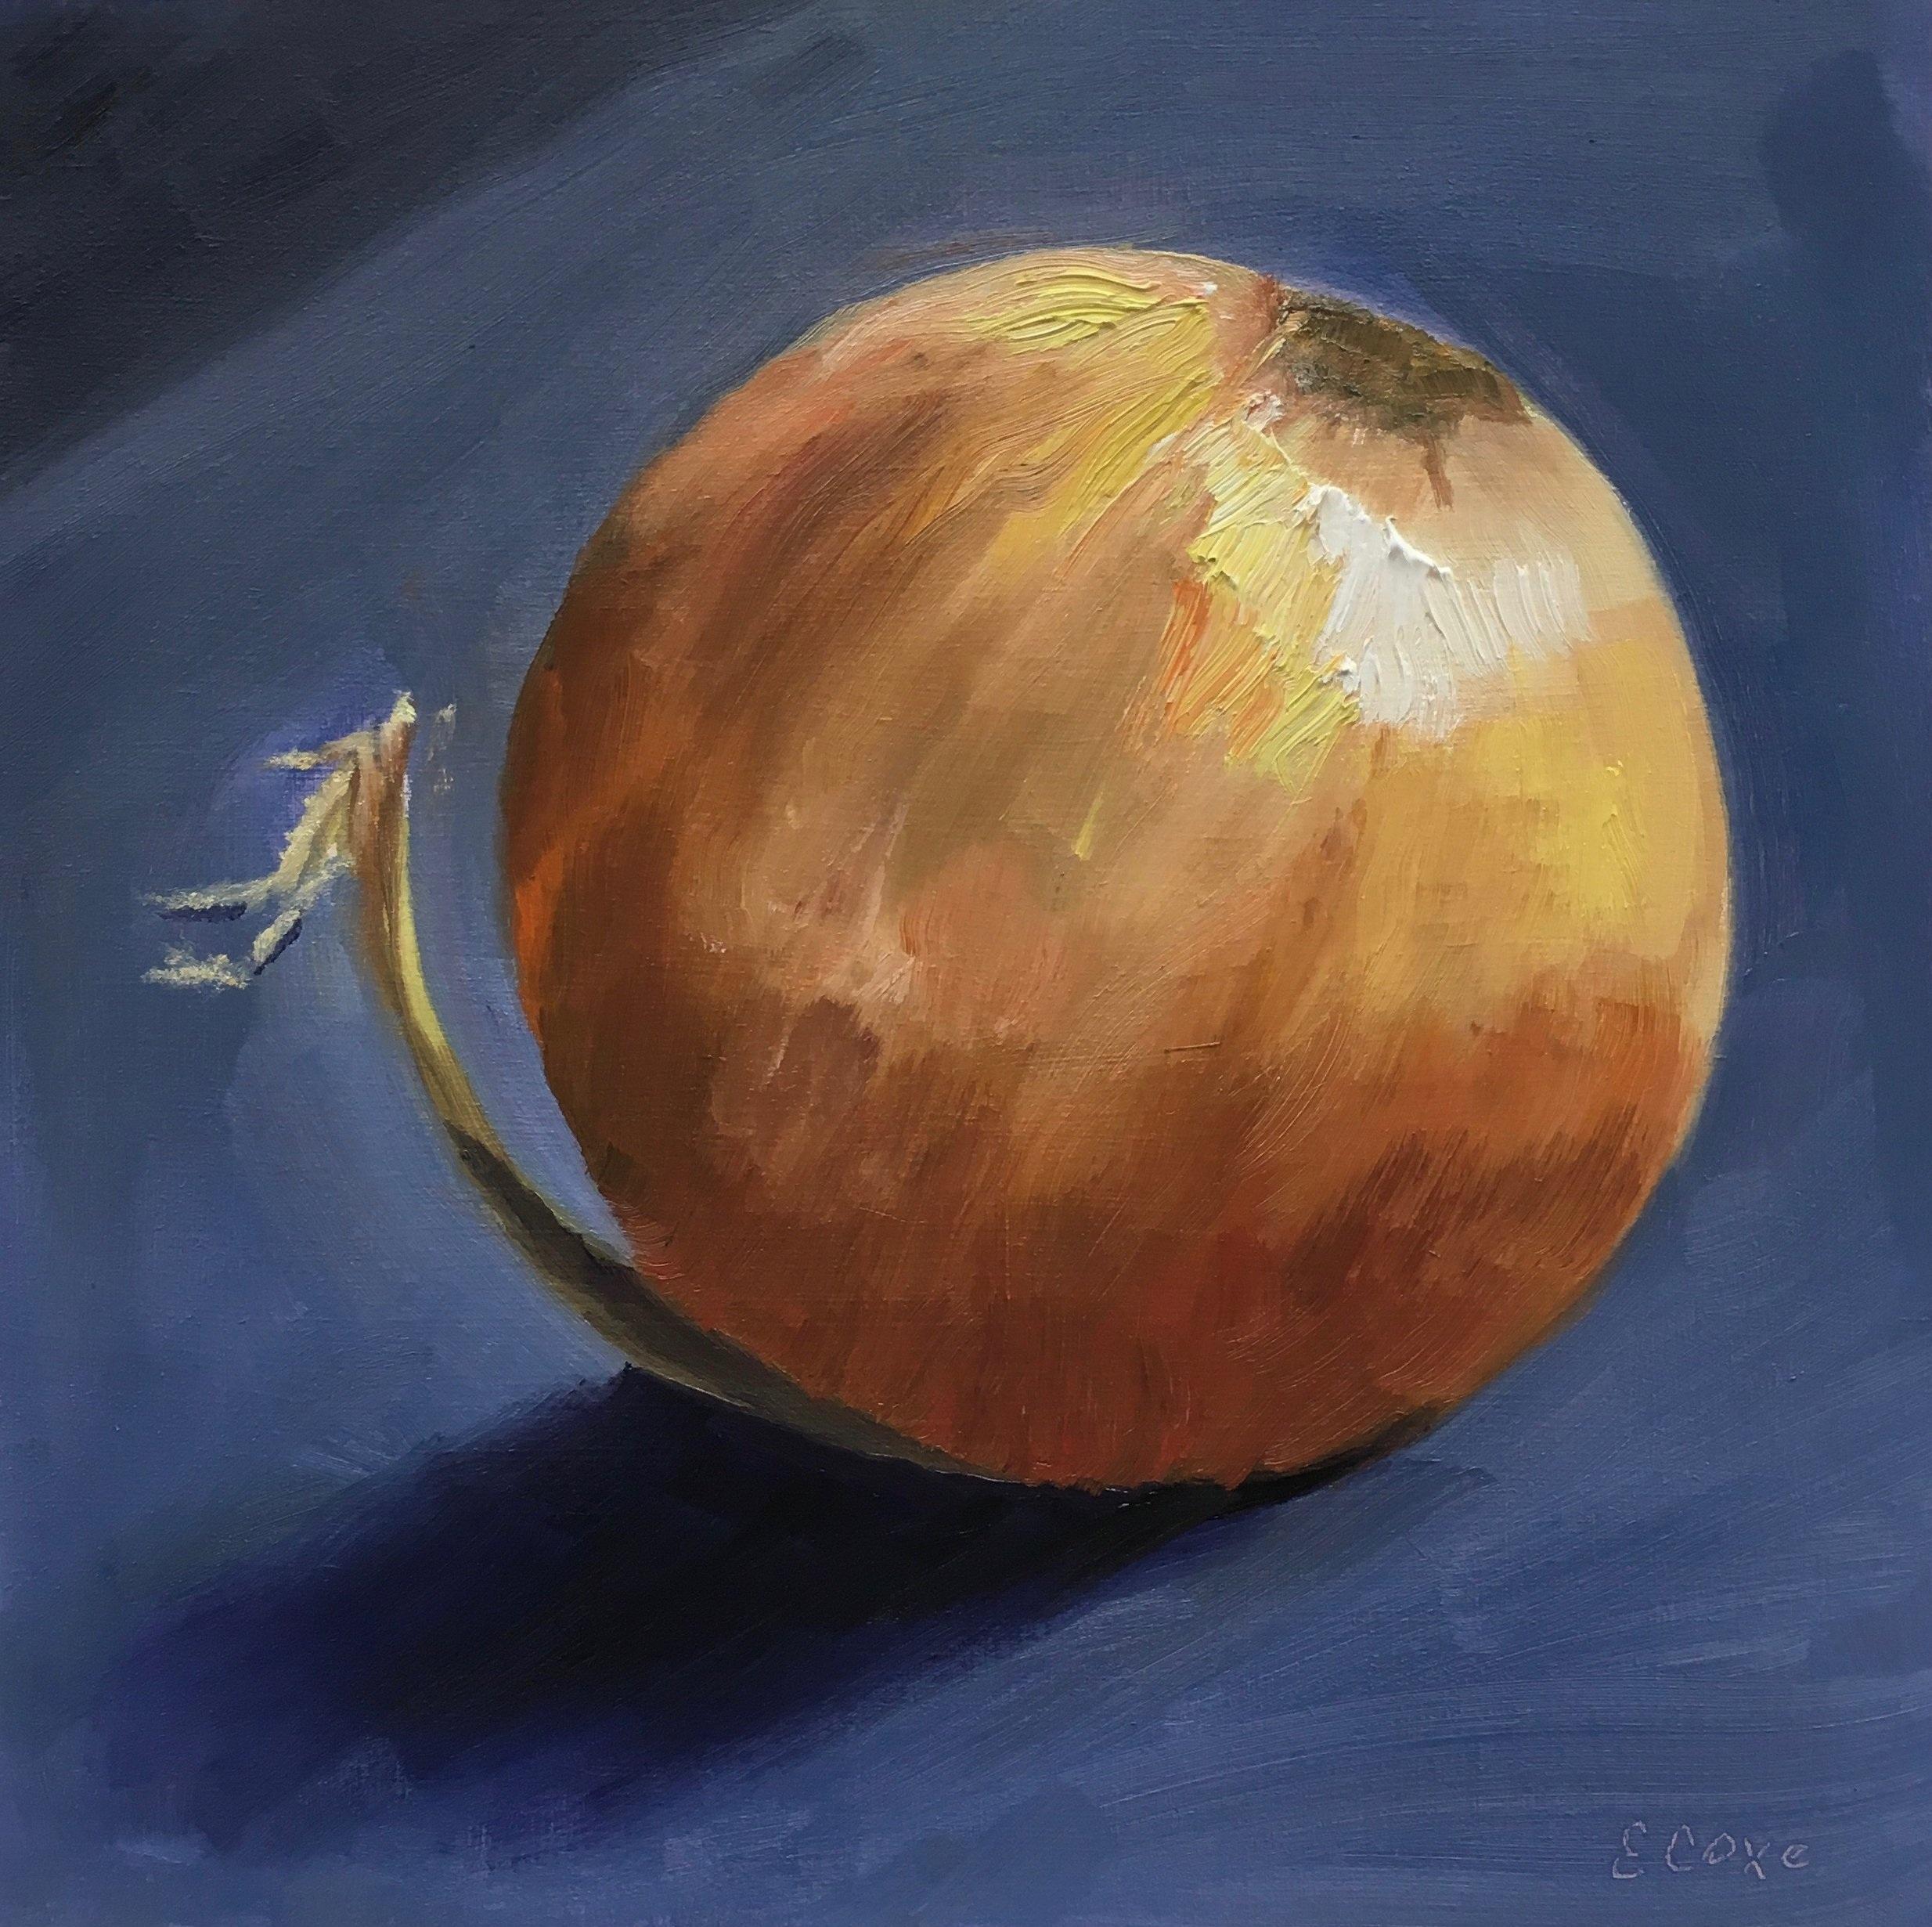 One Yellow Onion